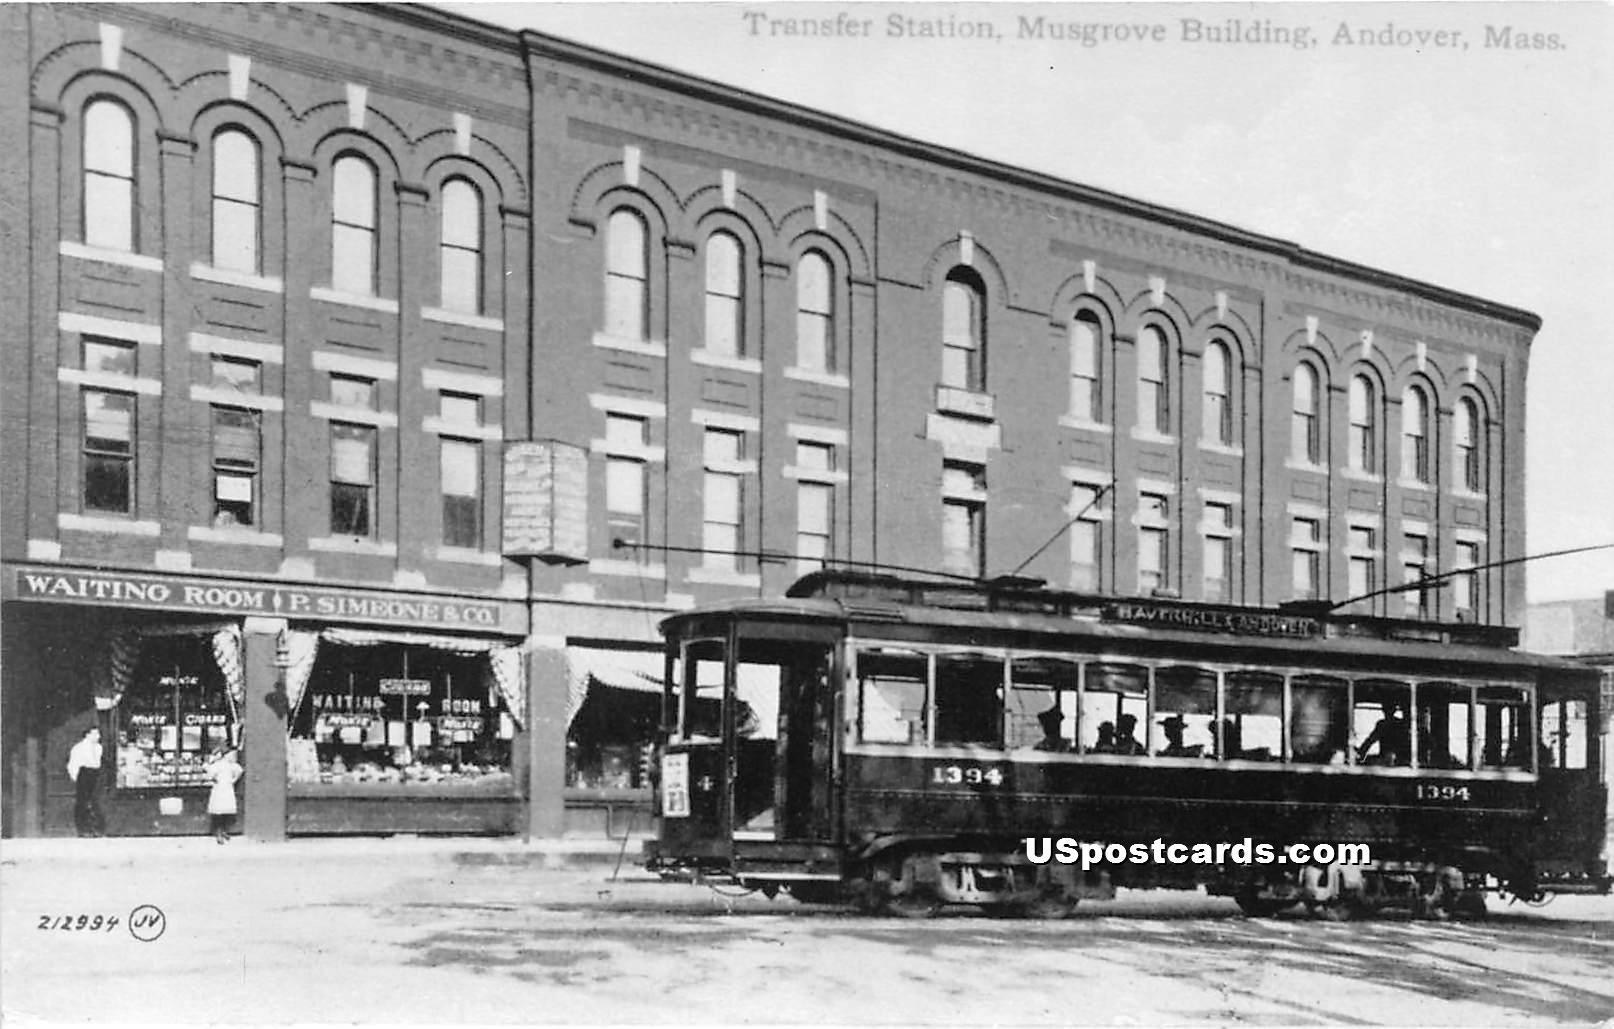 Trolley - Misc, Massachusetts MA Postcard